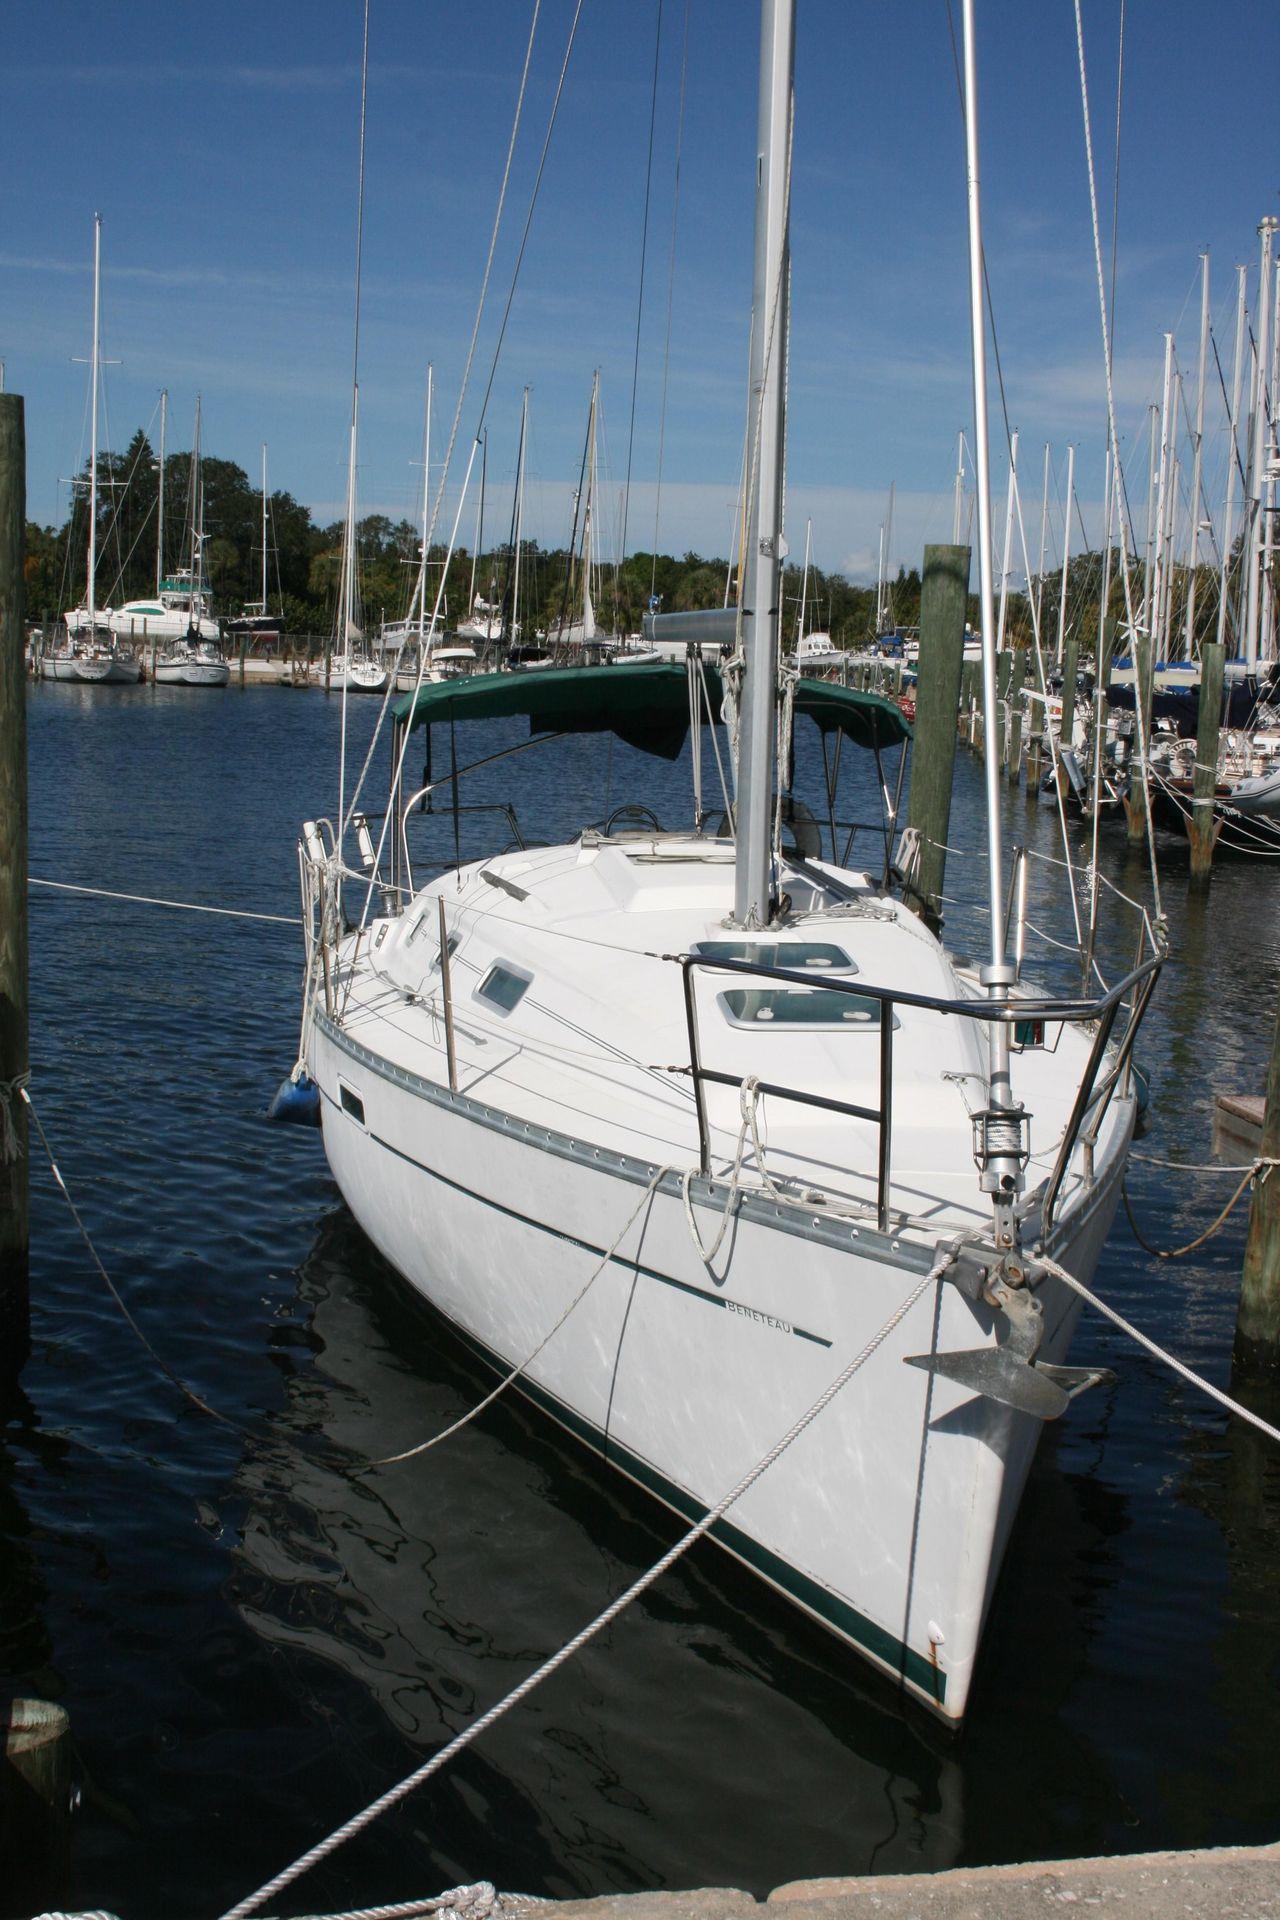 2000 Used Beneteau 311 Centerboard Cruiser Sailboat For Sale